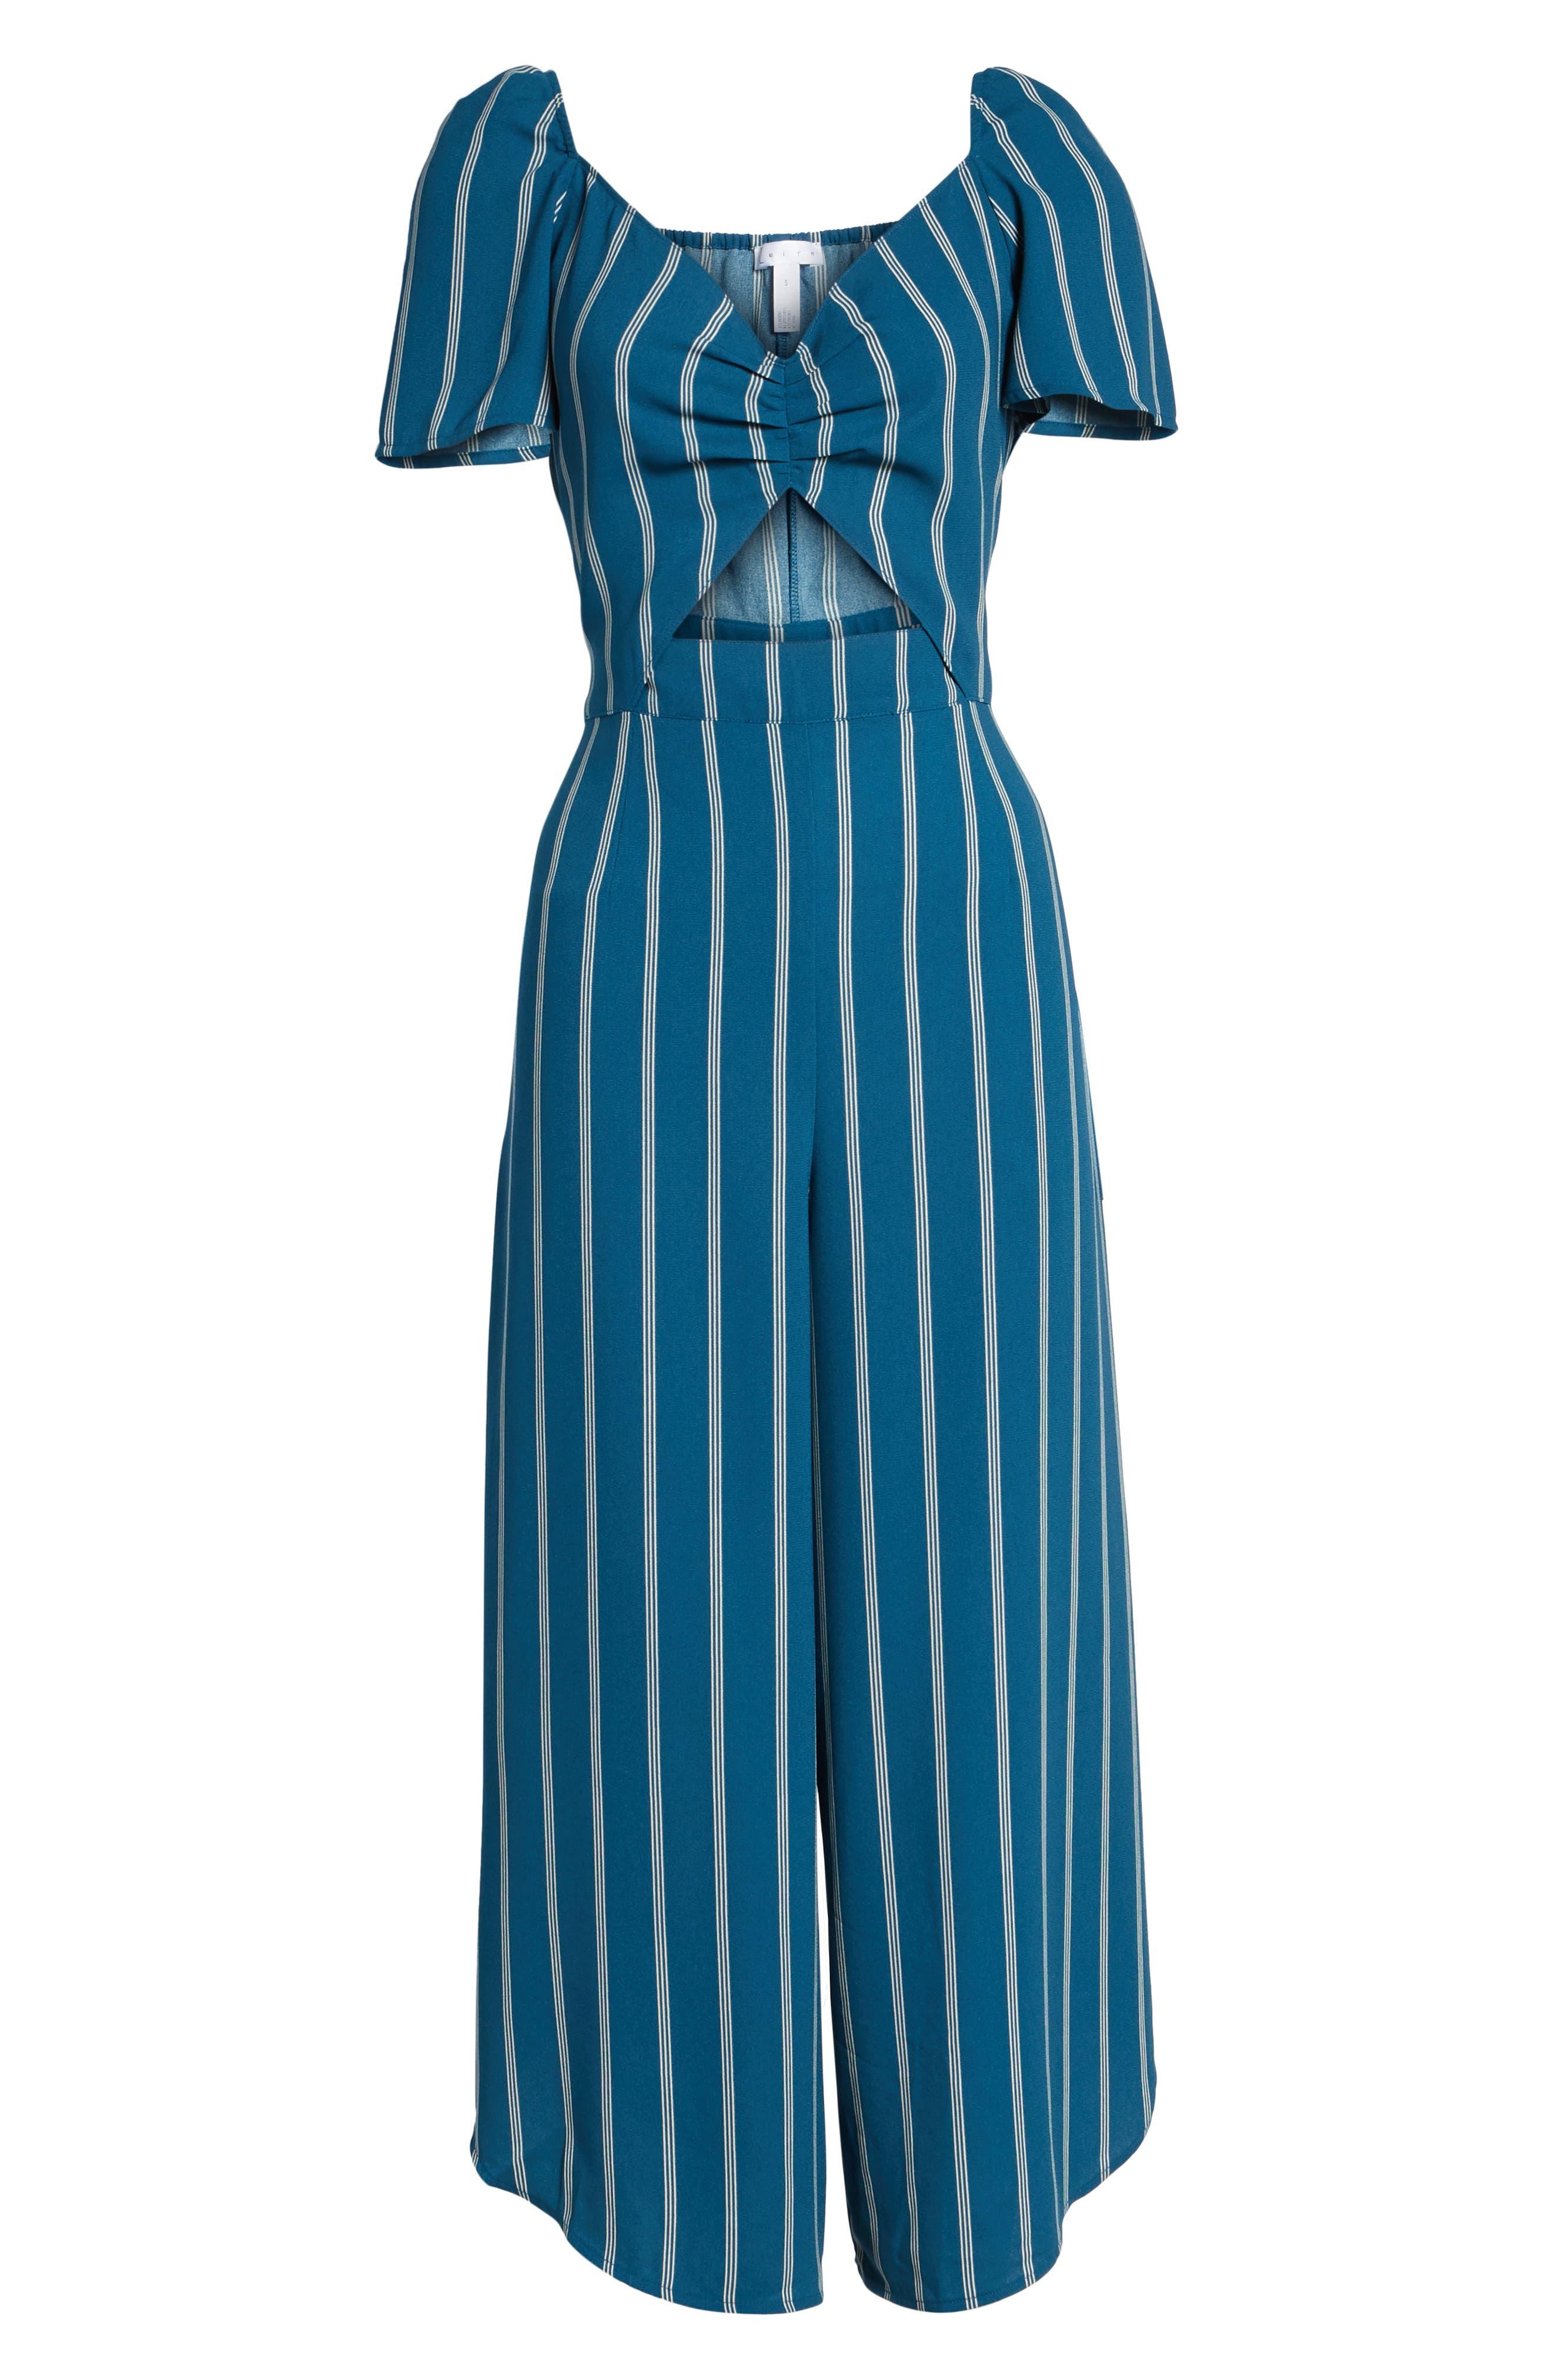 Cutout Culotte Jumpsuit,                             Alternate thumbnail 6, color,                             Teal Seagate Pinstripe